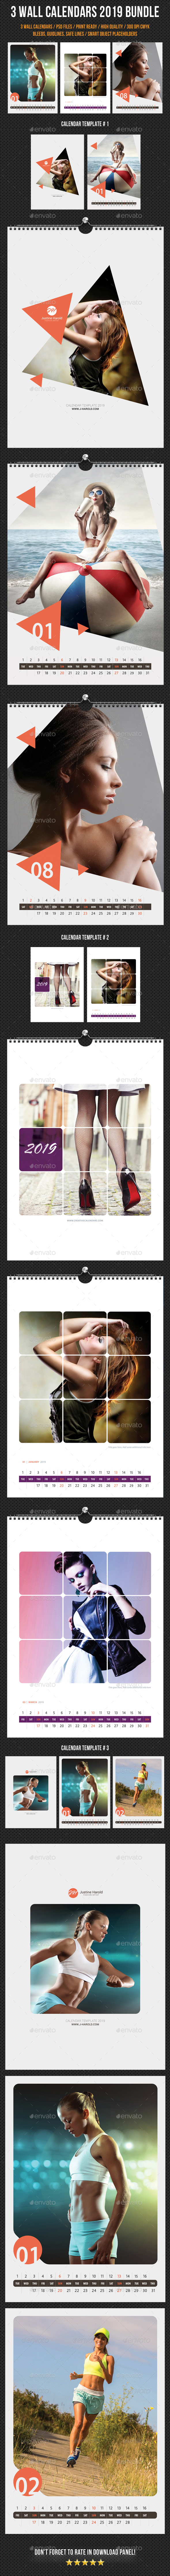 Creative Wall Calendars 2019 Bundle 5 - Calendars Stationery